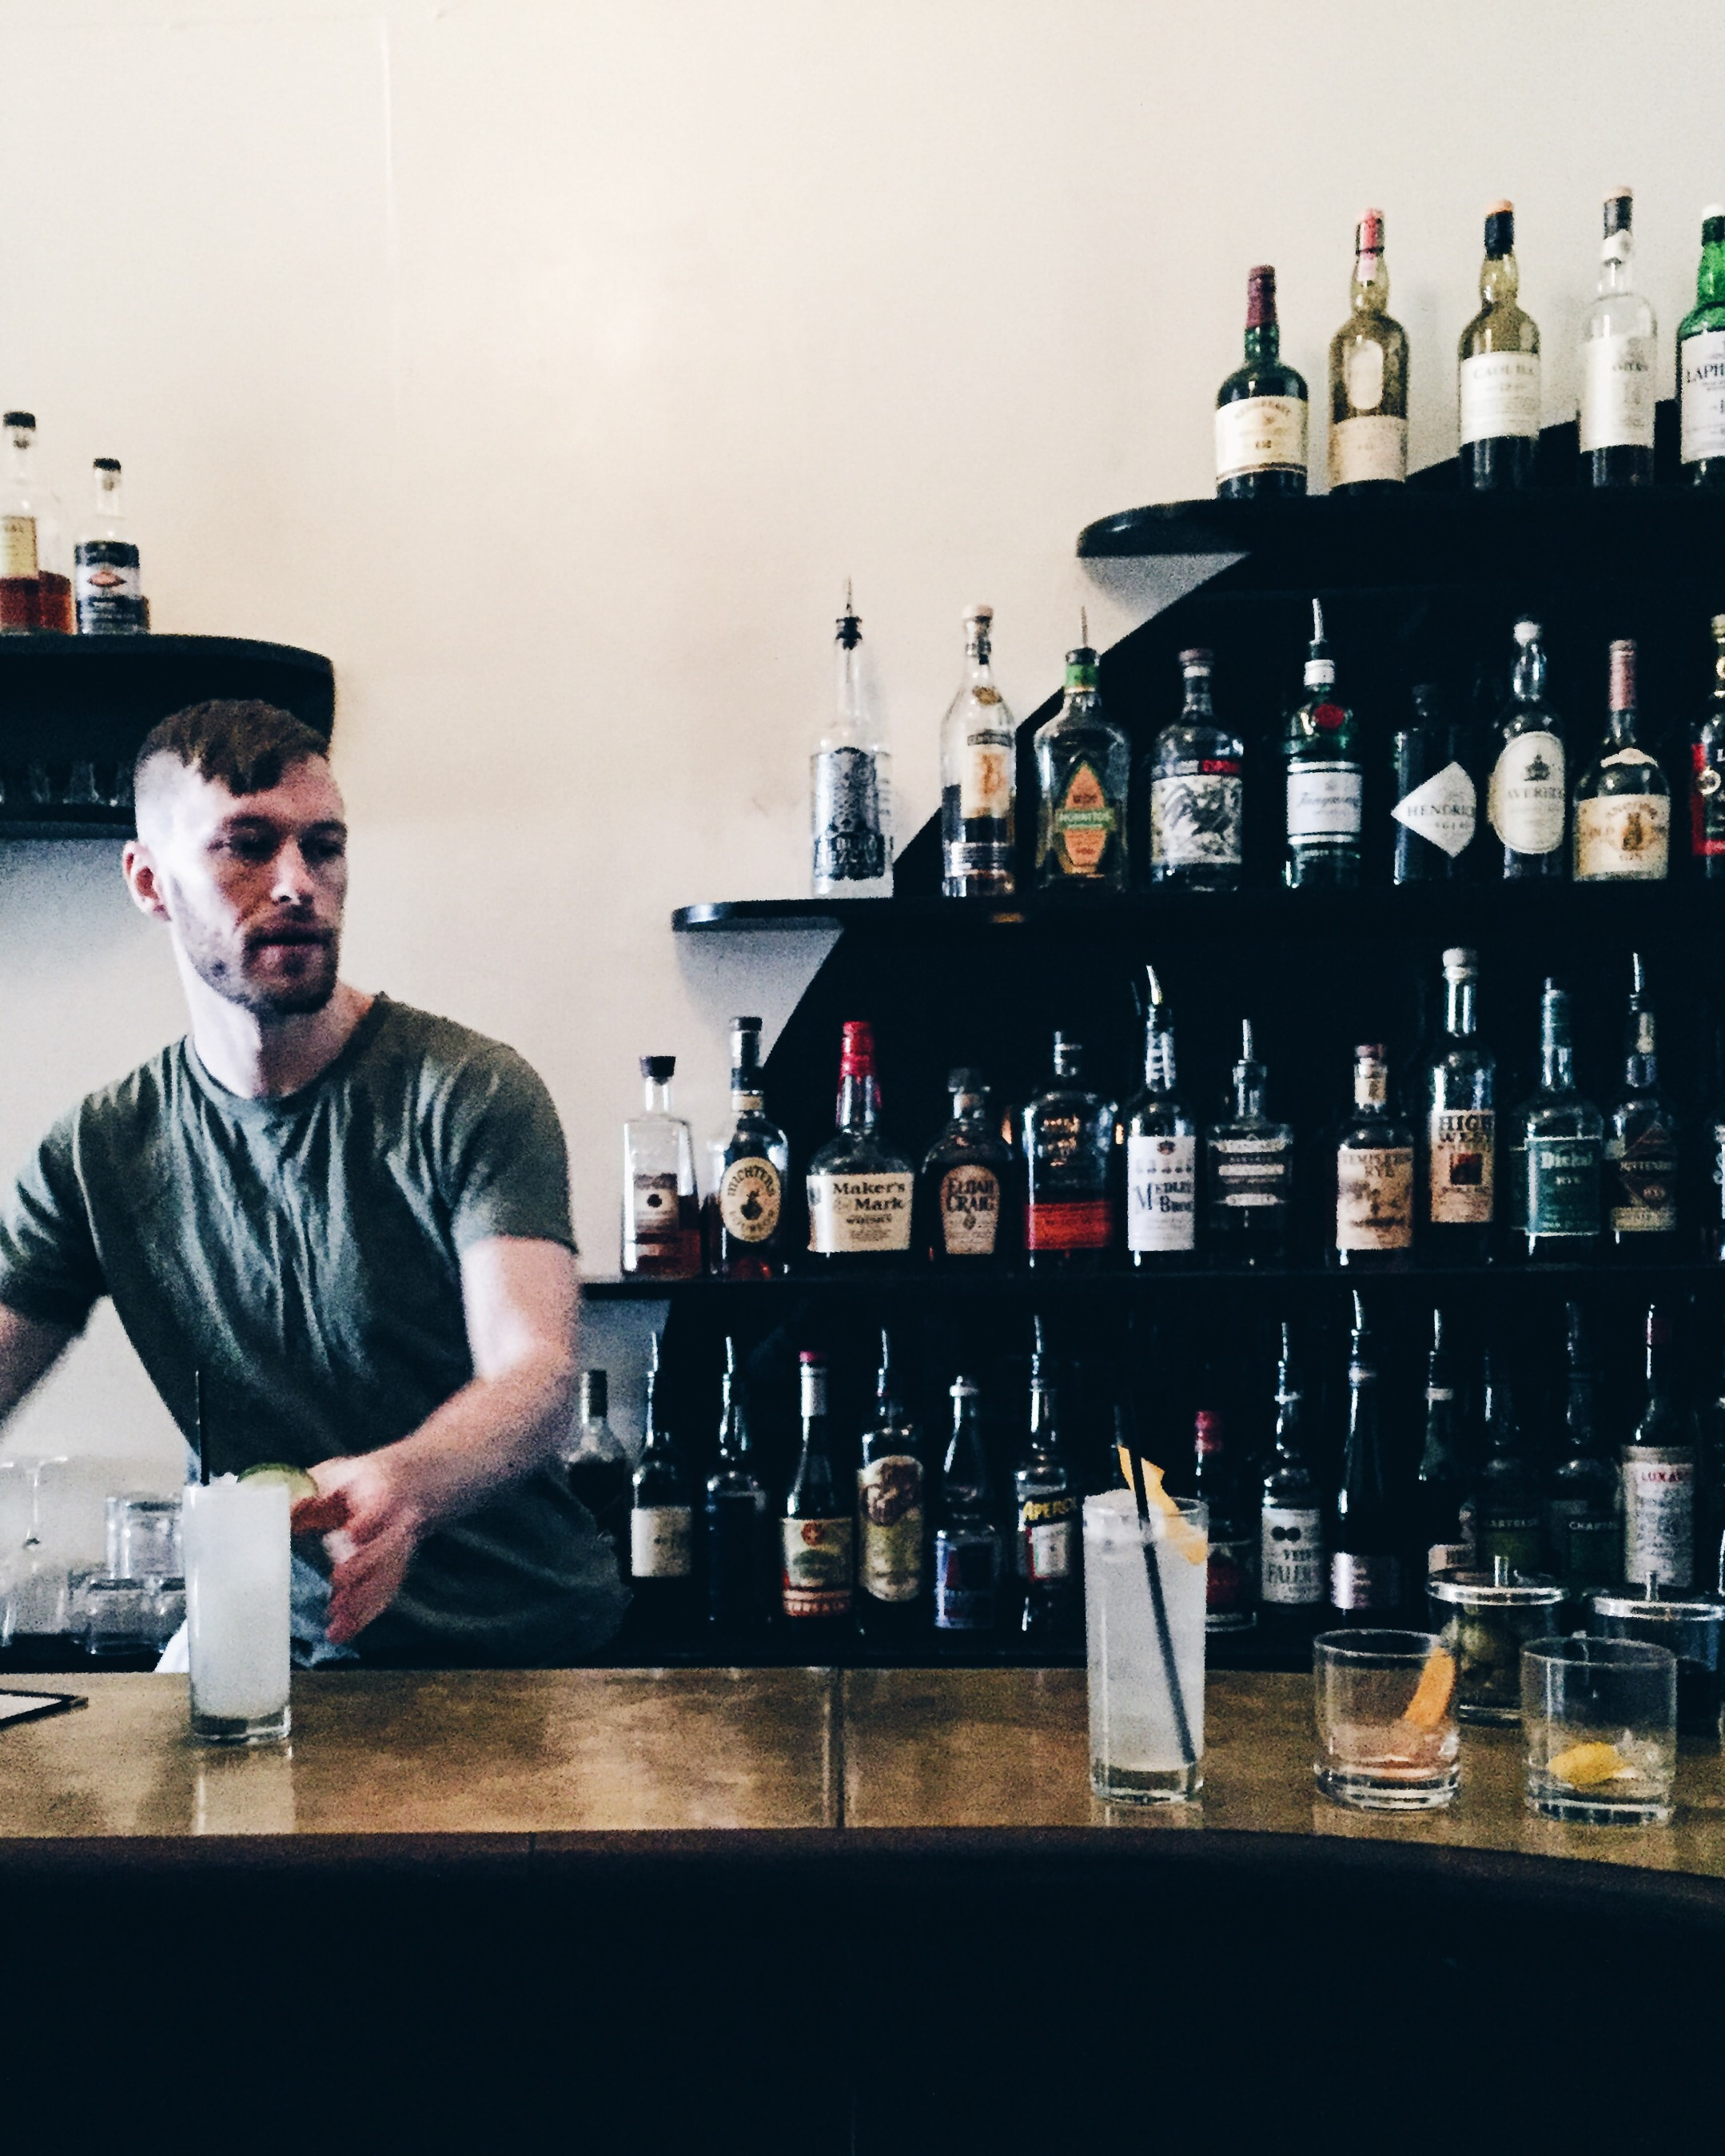 Brass-topped bar